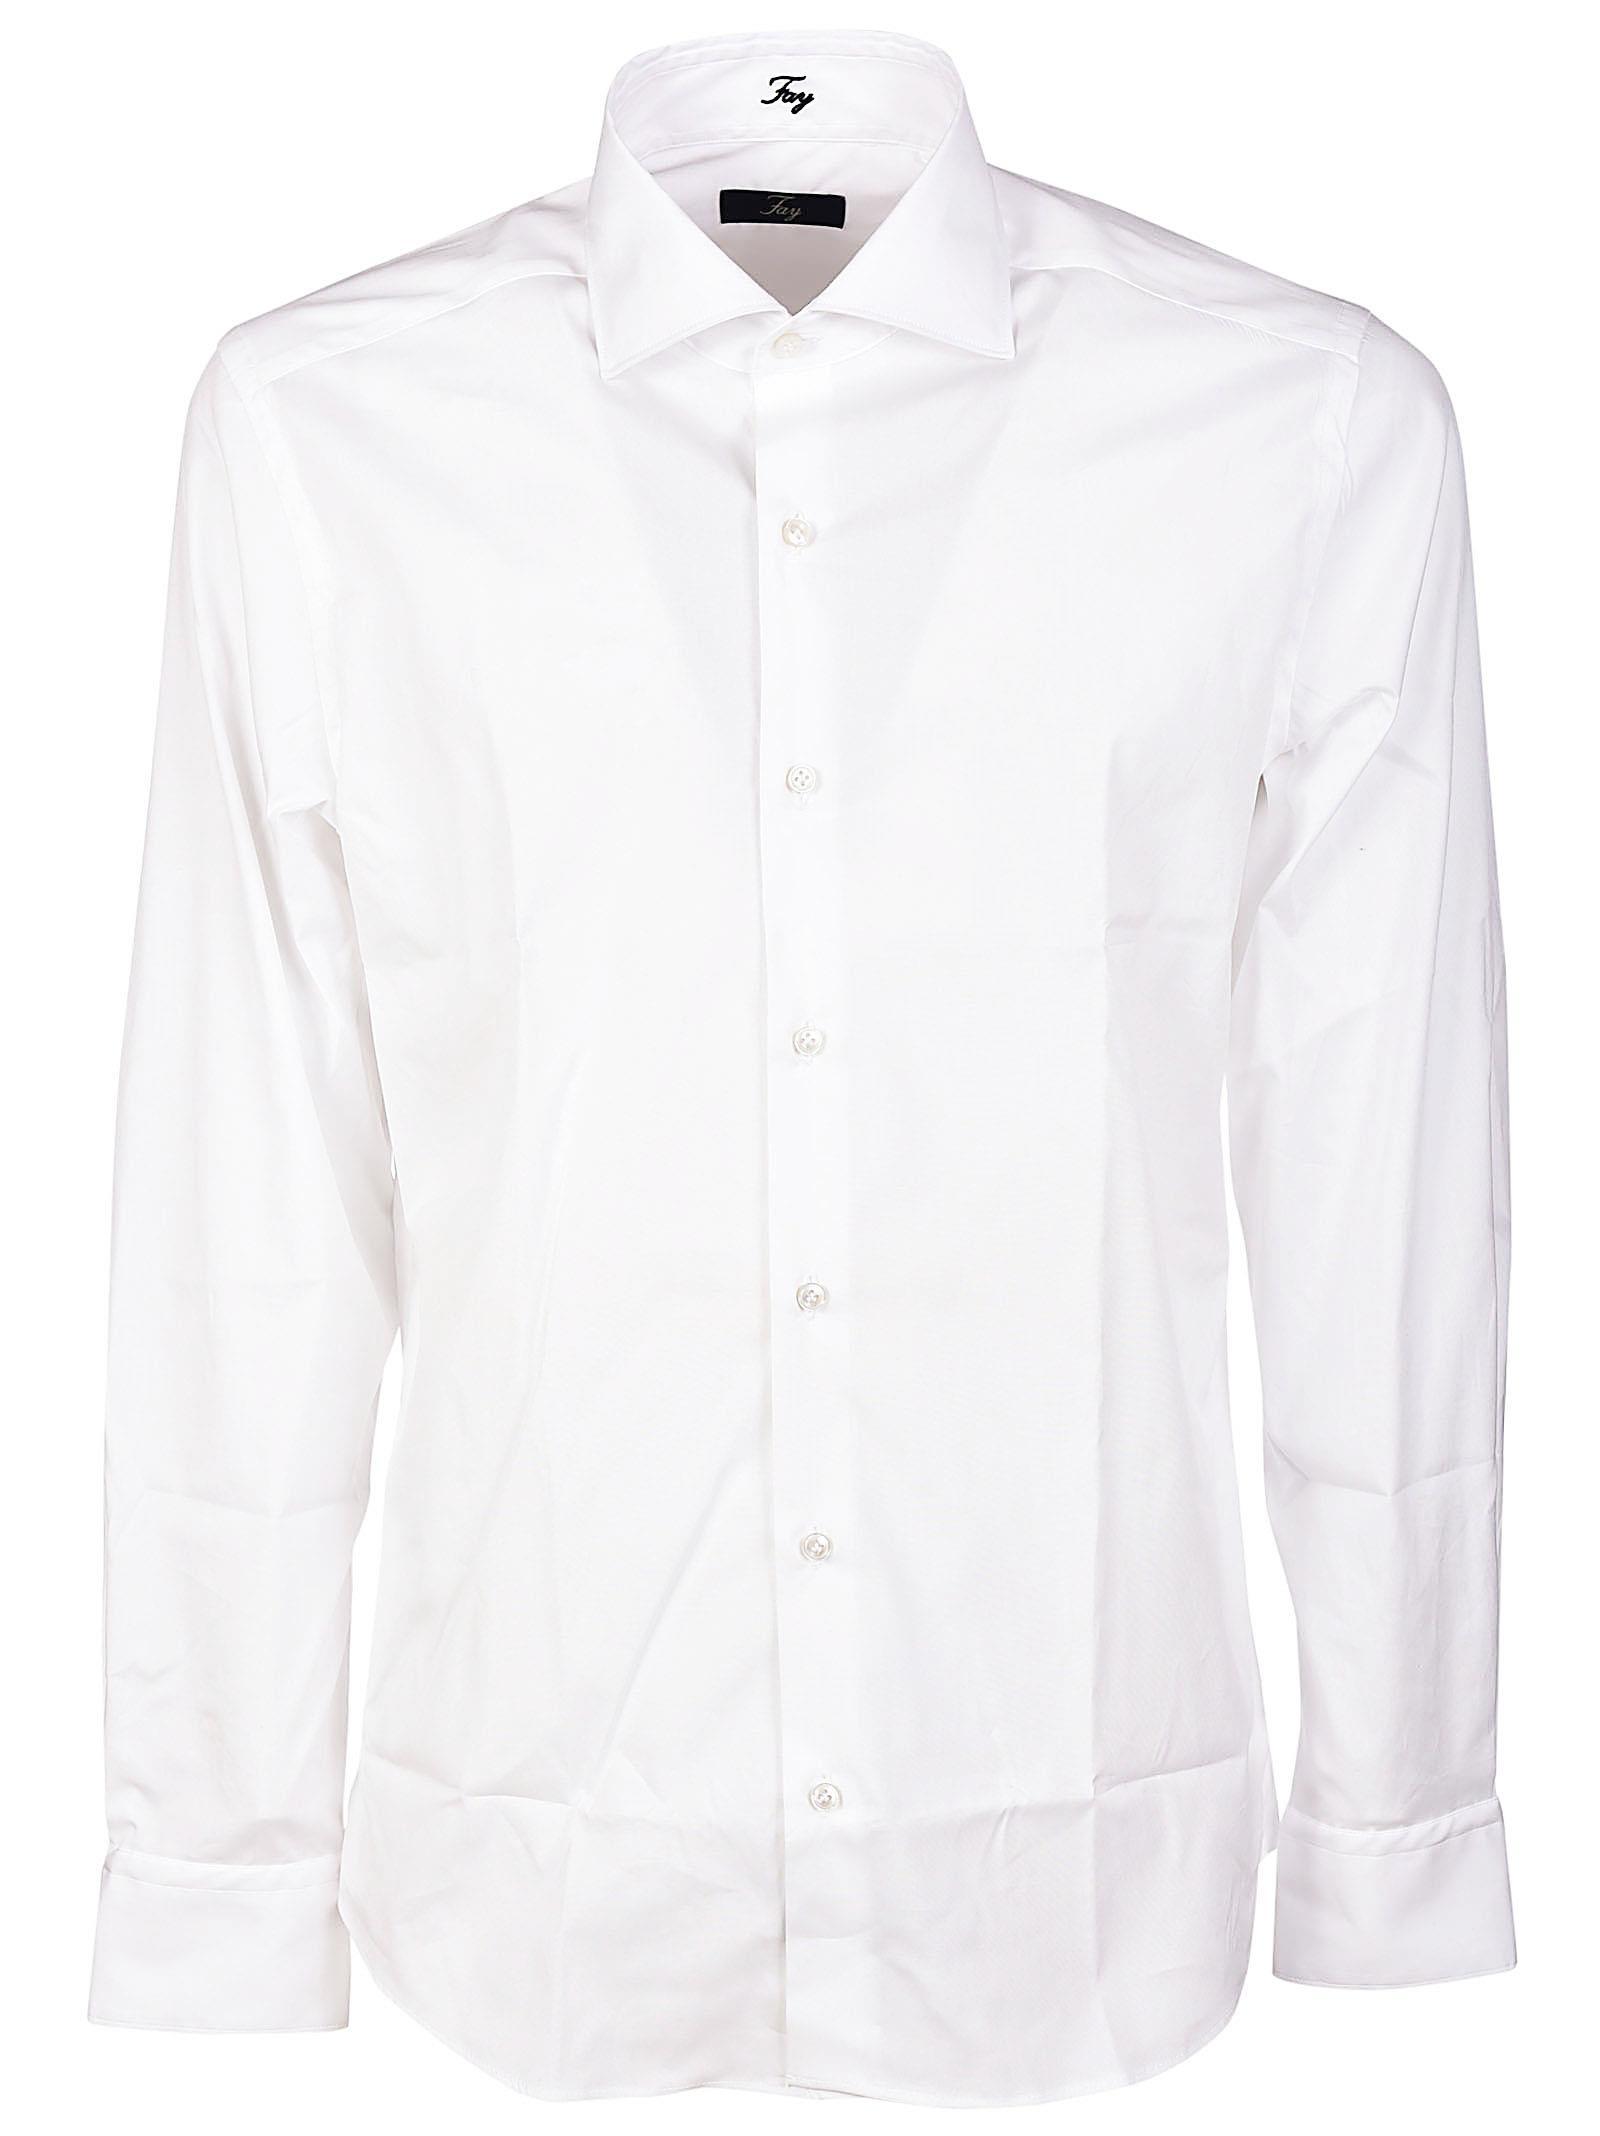 Camicia bianca classica in cotone